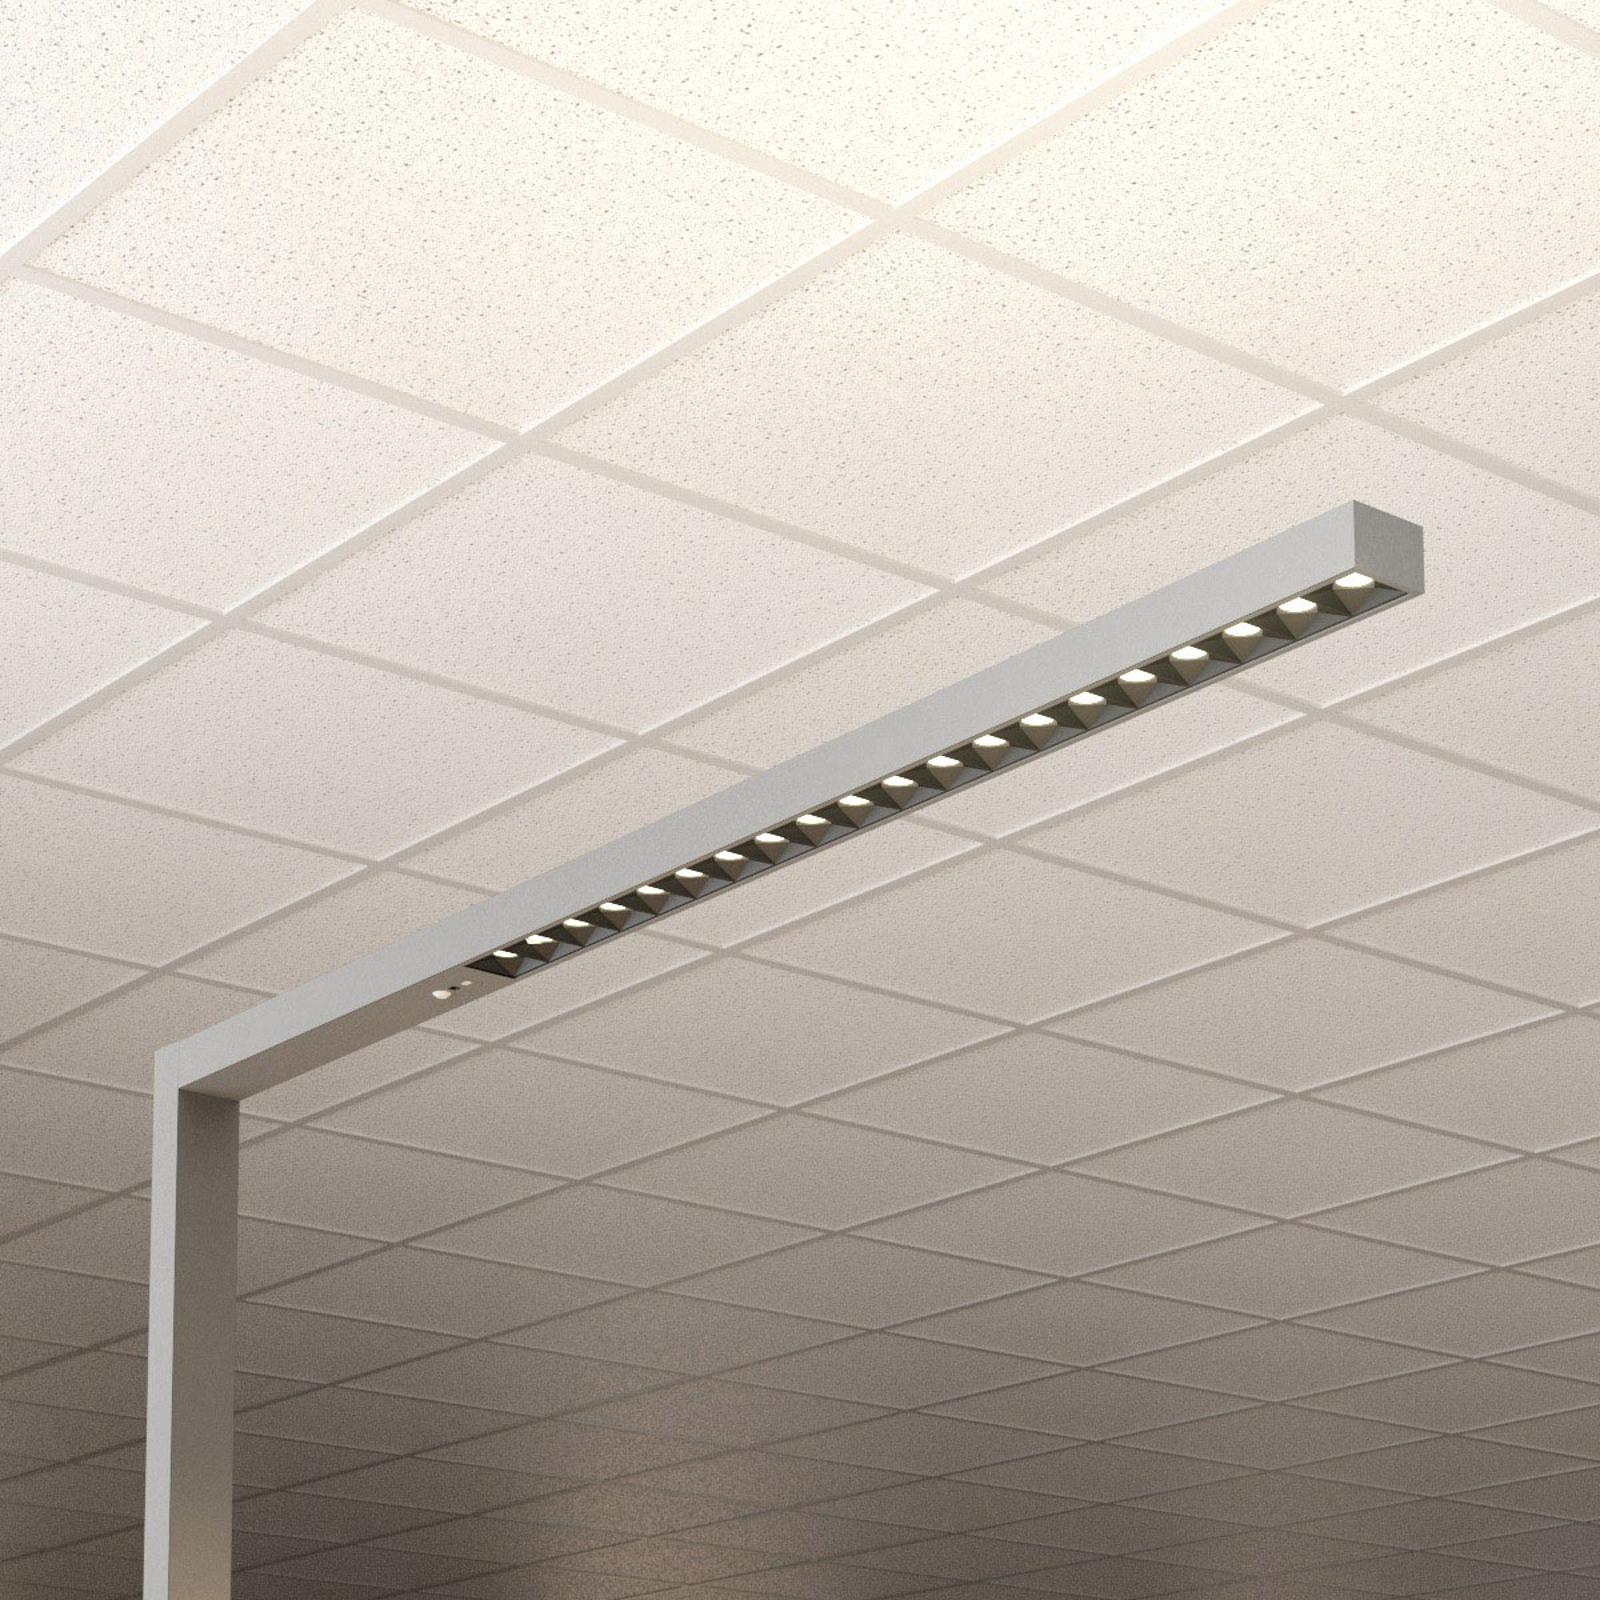 Toimiston LED-lattiavalo Laris hopea 3 000–6 000 K